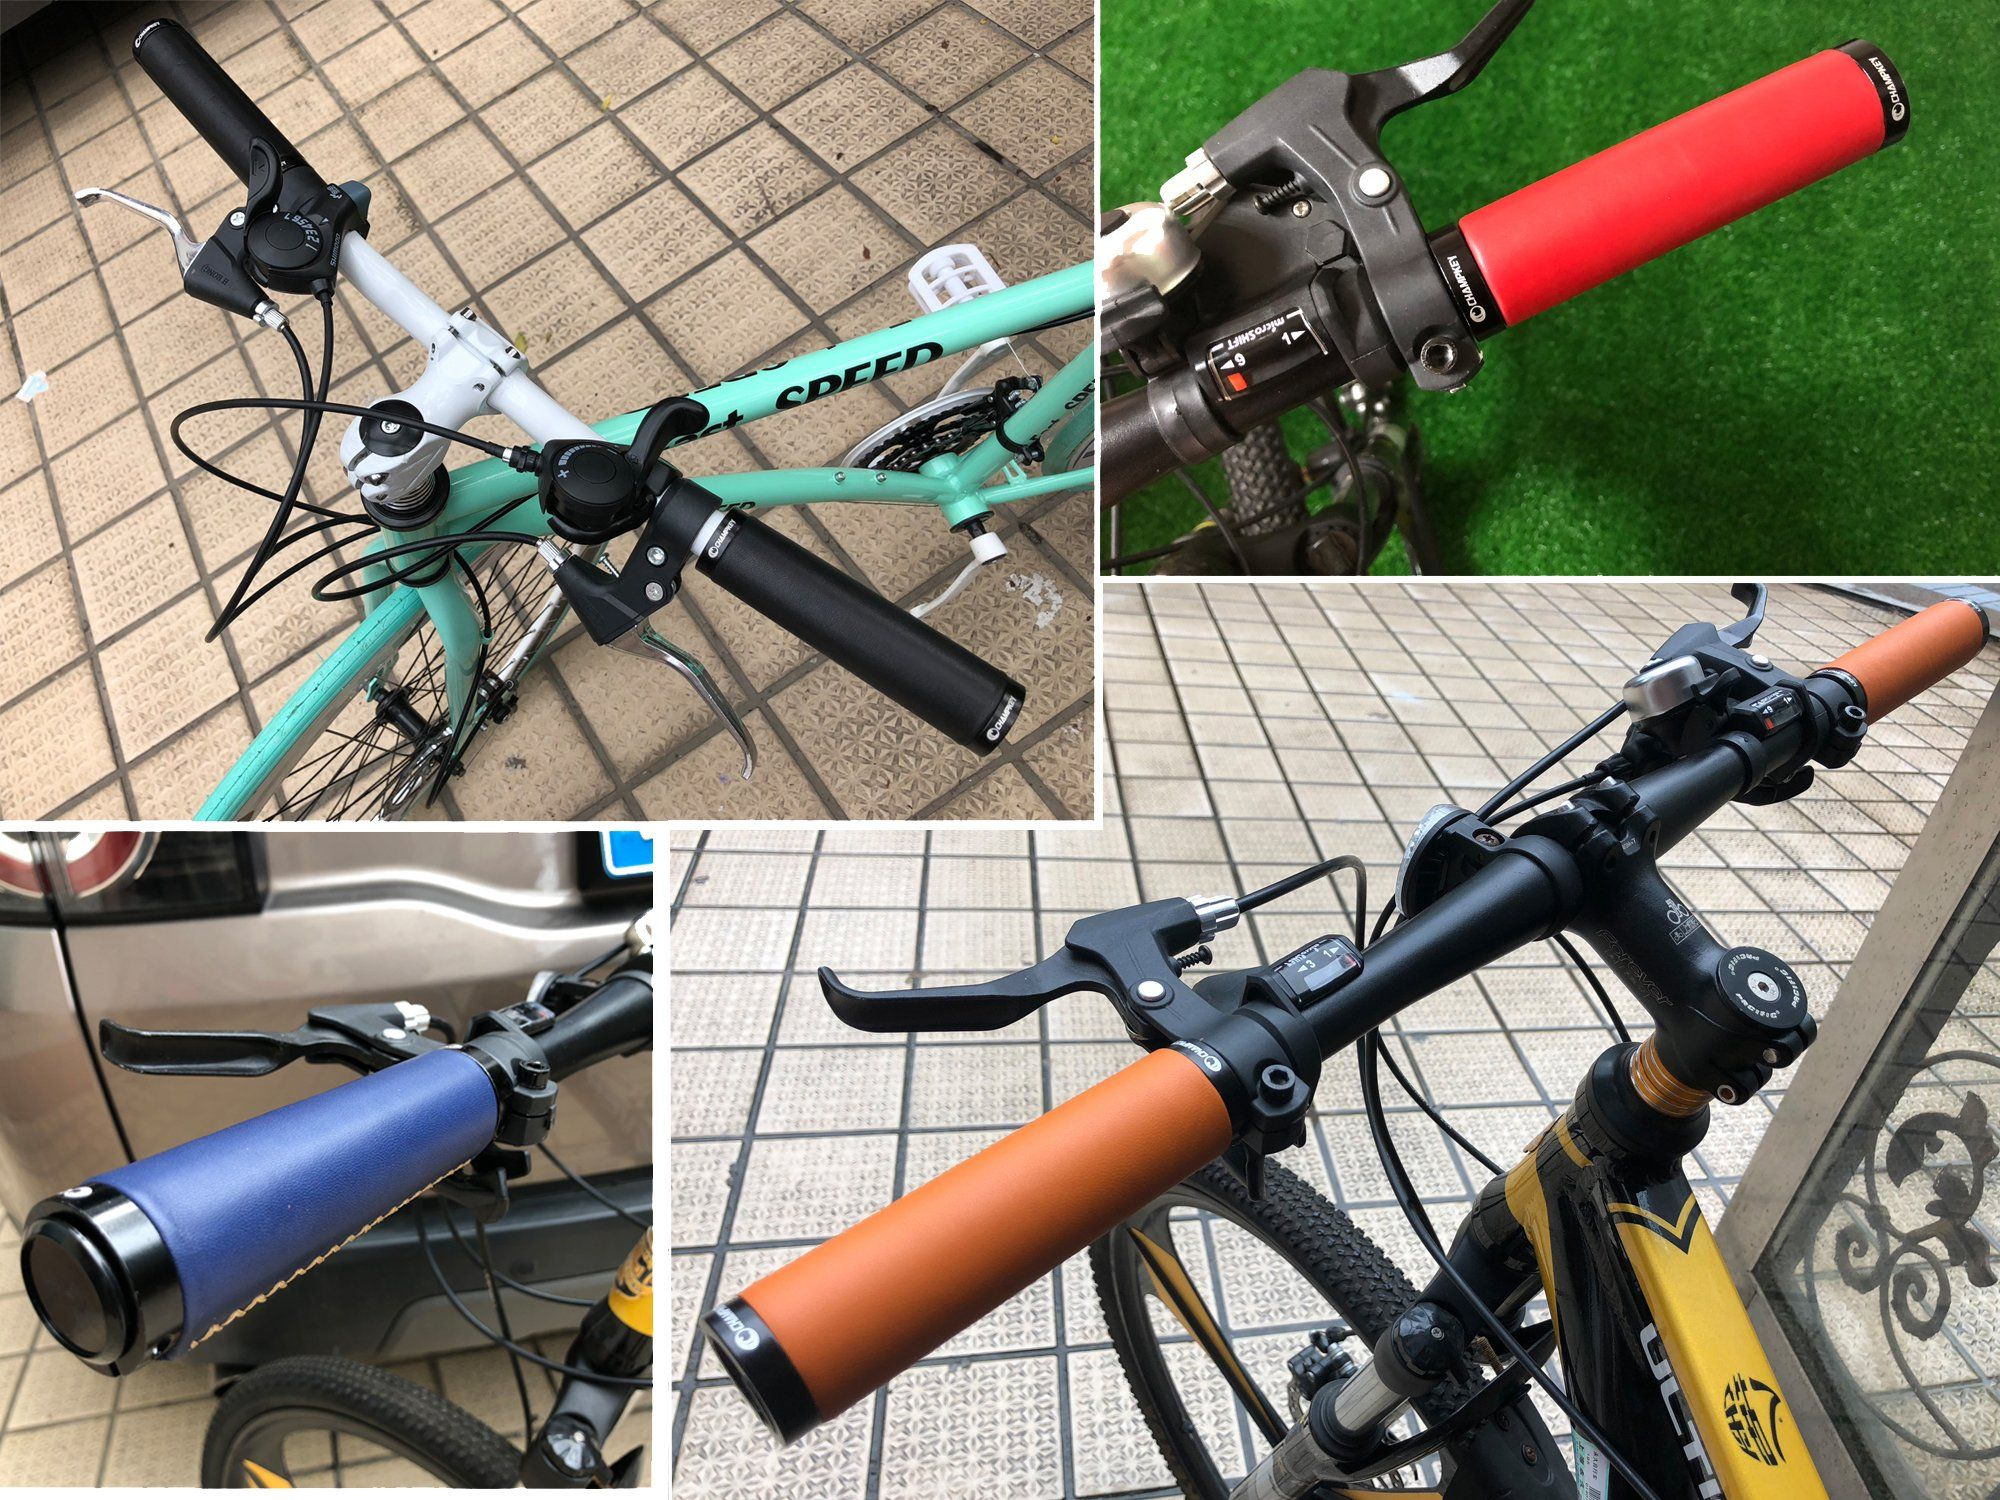 Champkey Ergonomics Comfort Design Genuine Leather Bicycle Handlebar Grips 1Pair